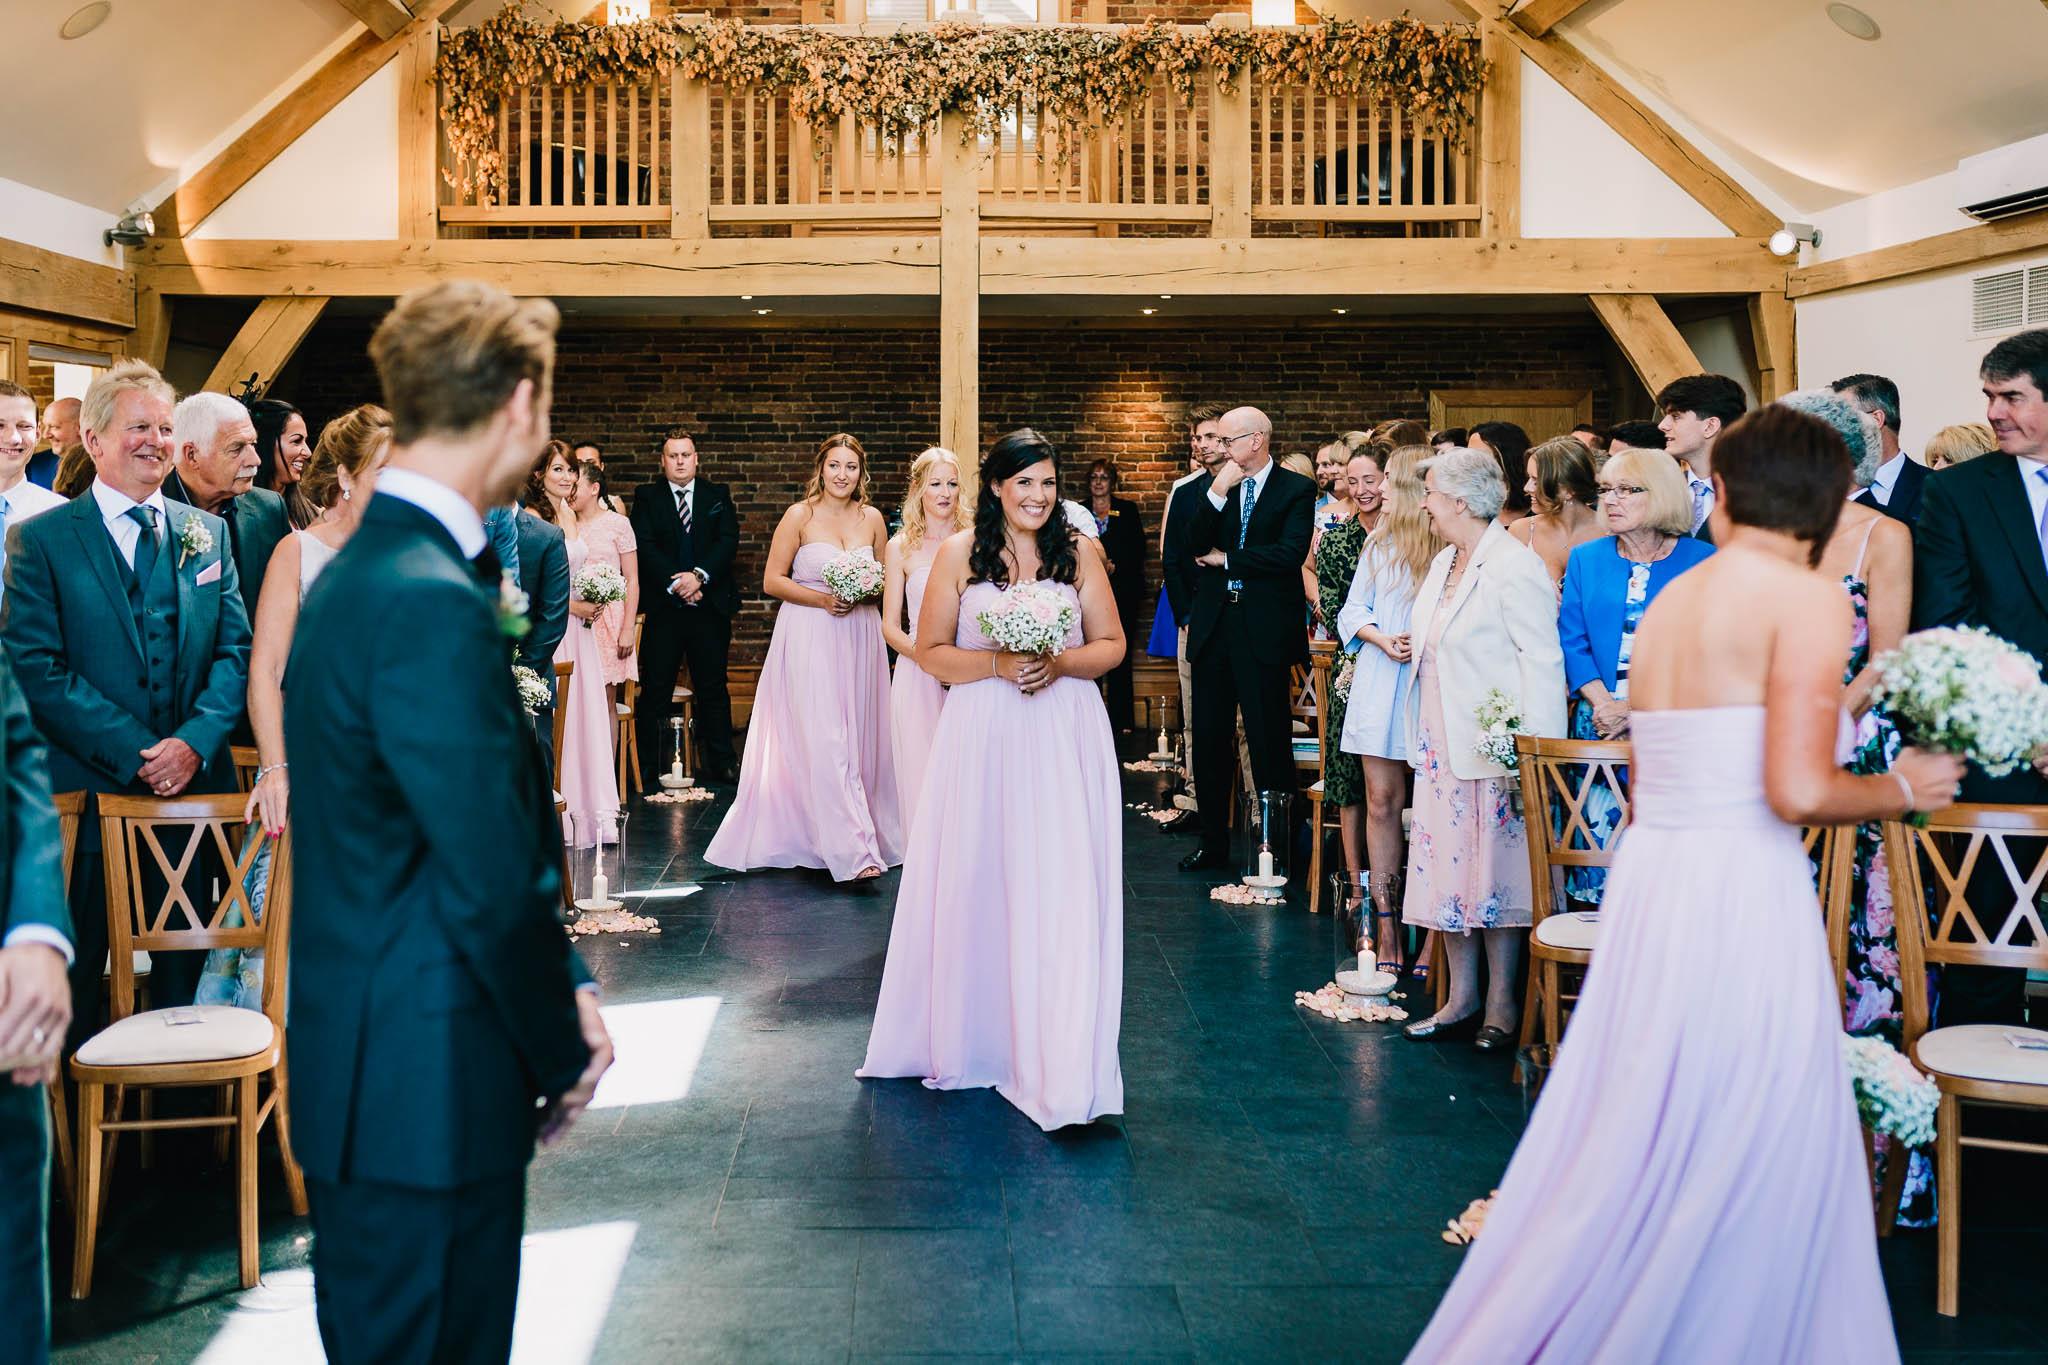 BRIDESMAIDS WALKING DOWN THE ISLE IN CHURCH